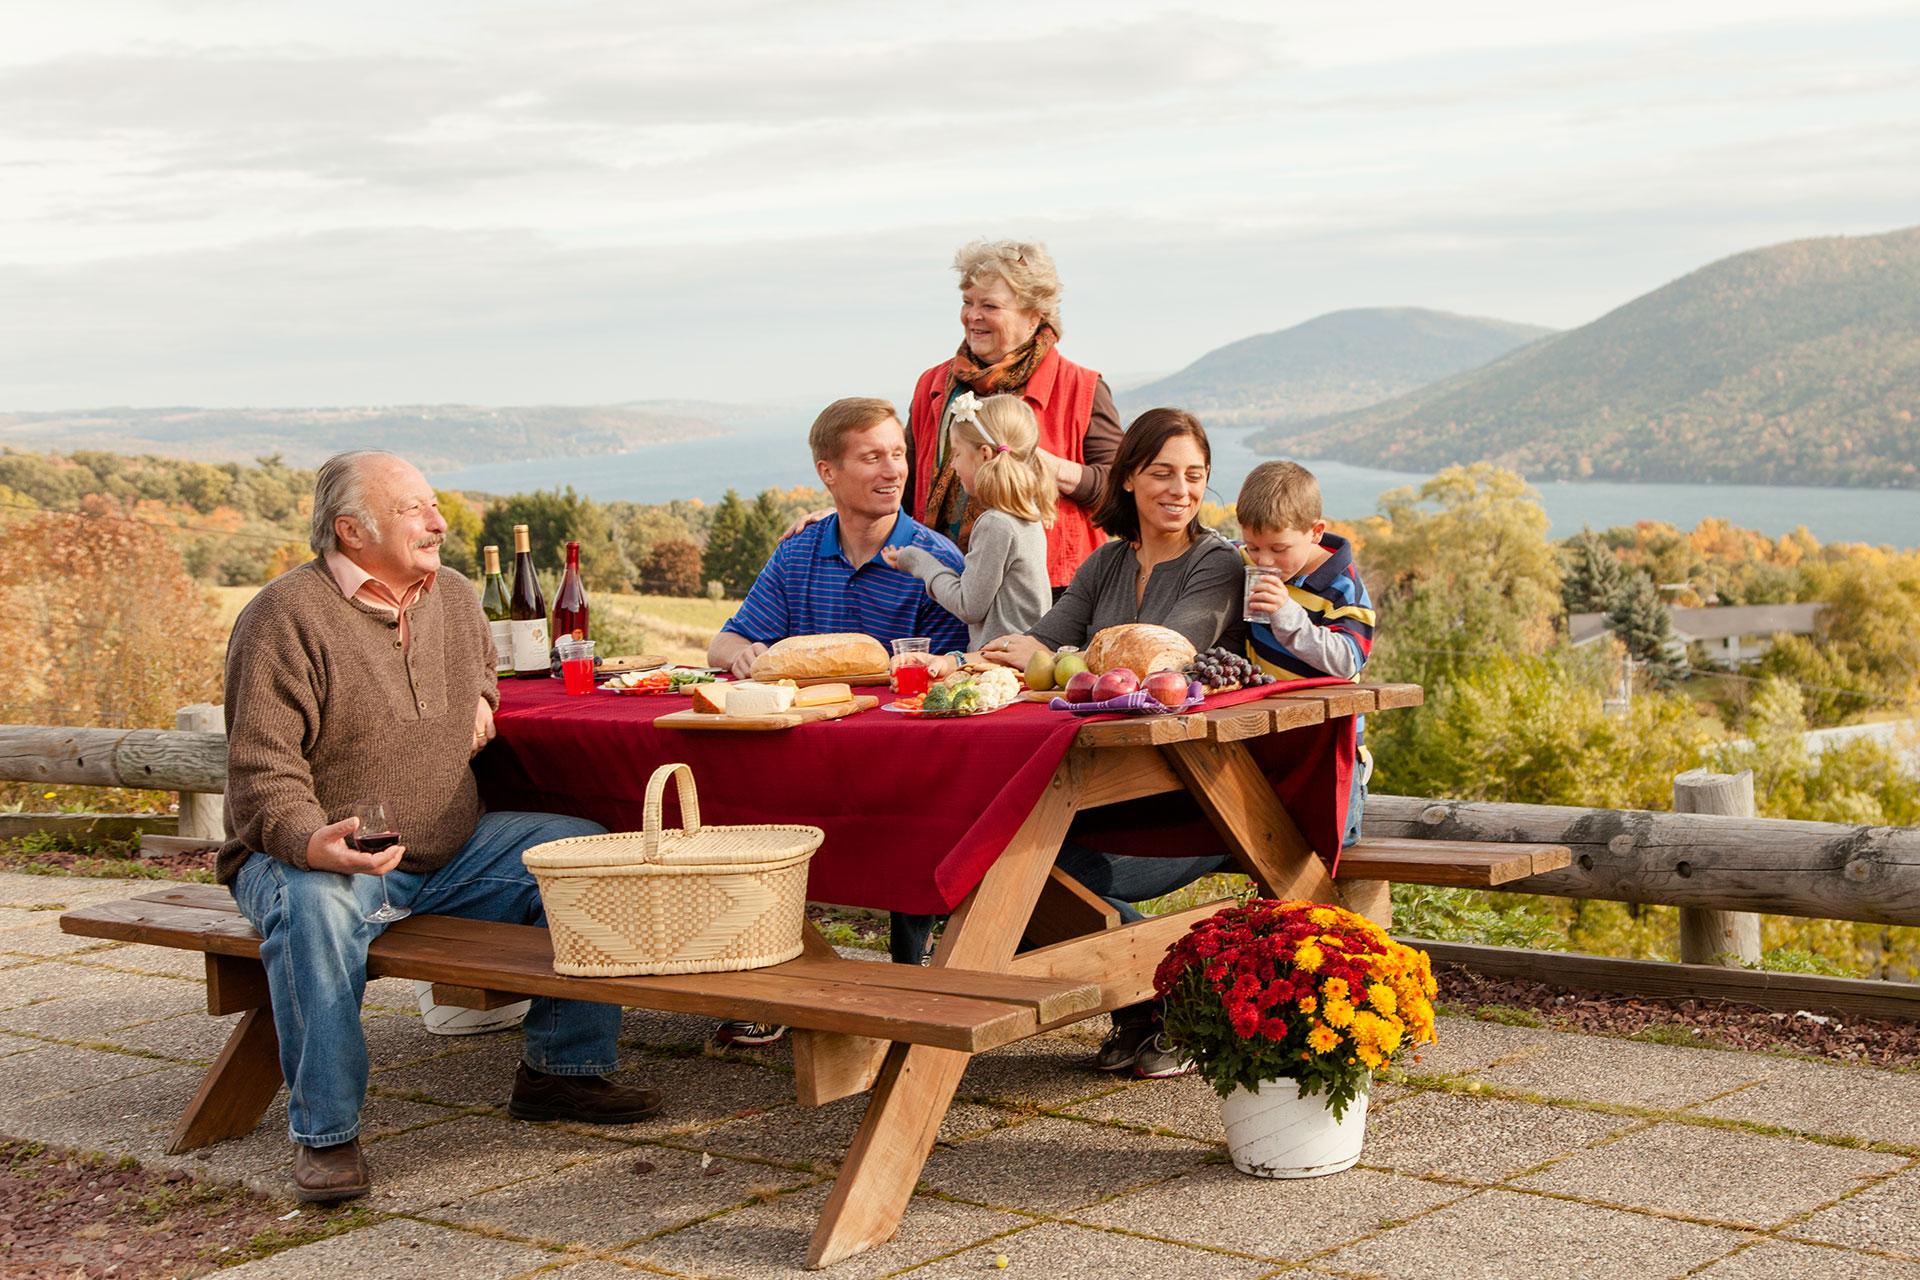 Family Picnic in the Finger Lakes